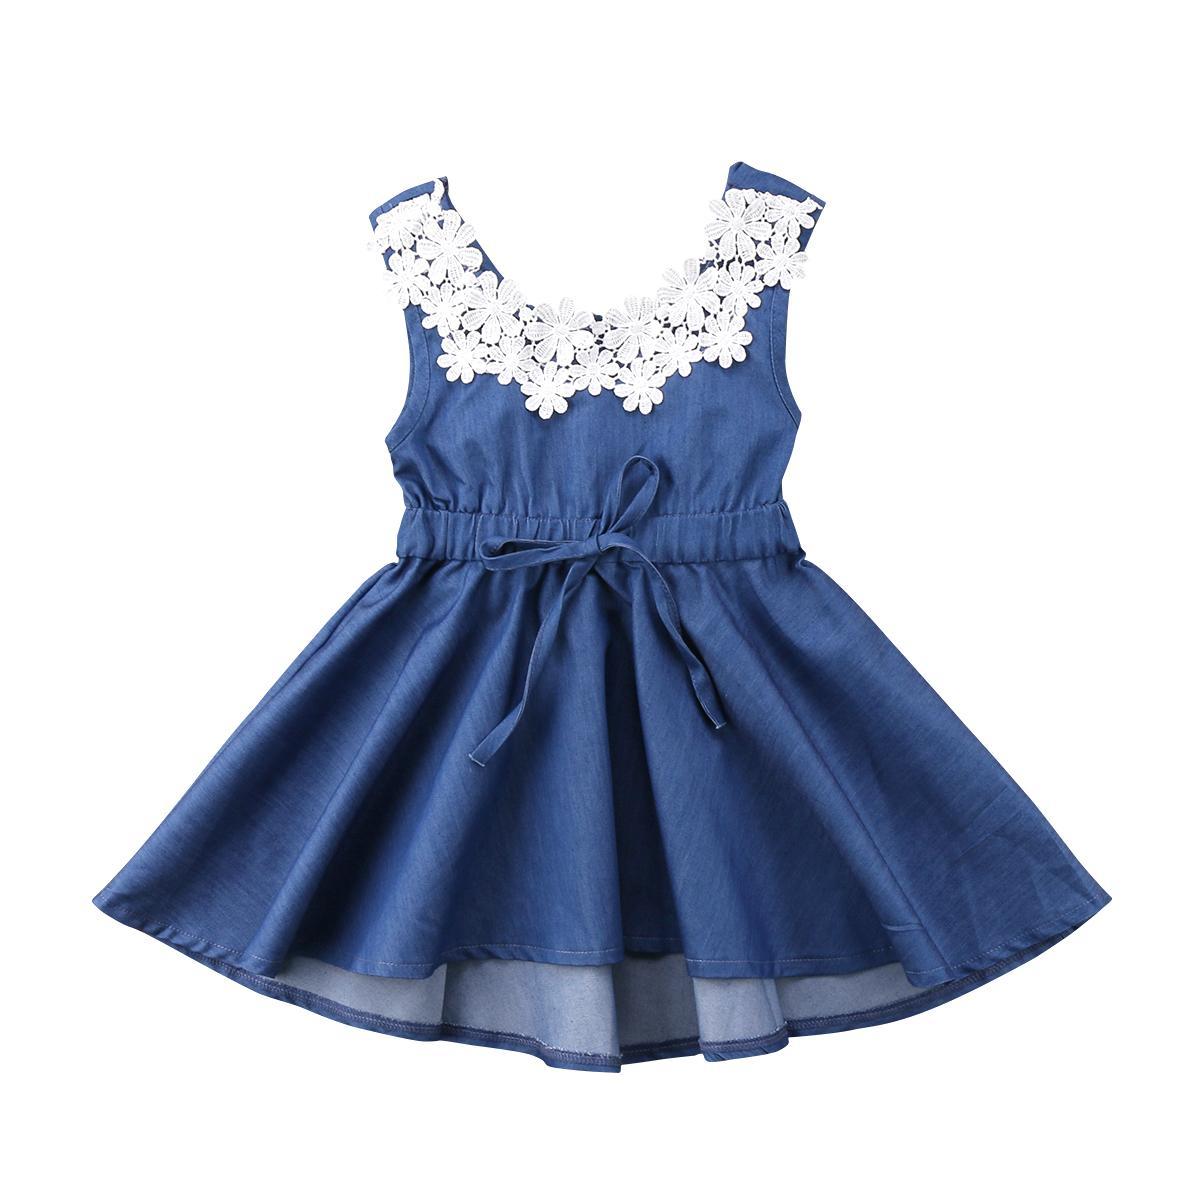 d723ca97c6 Adorable Toddler Kids Baby Girls Lace Floral Denim Princess Party Dress  Sundress Solid Lace Sleeveless Children Girl Dresses